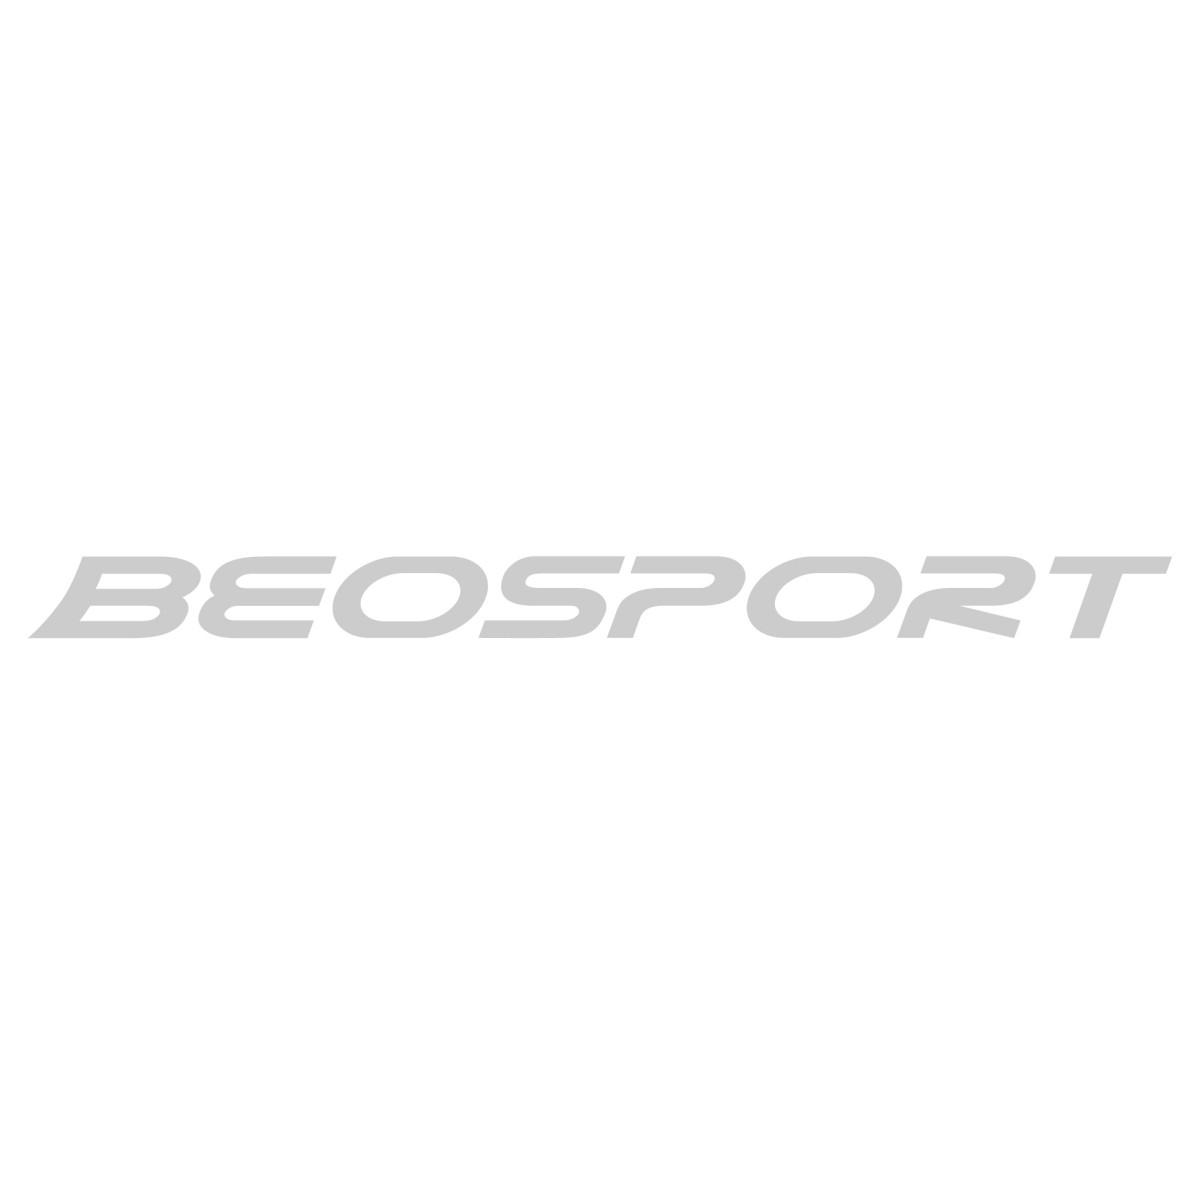 Wilson Alu Power Soft 1.25mm x 200m žice za rekete